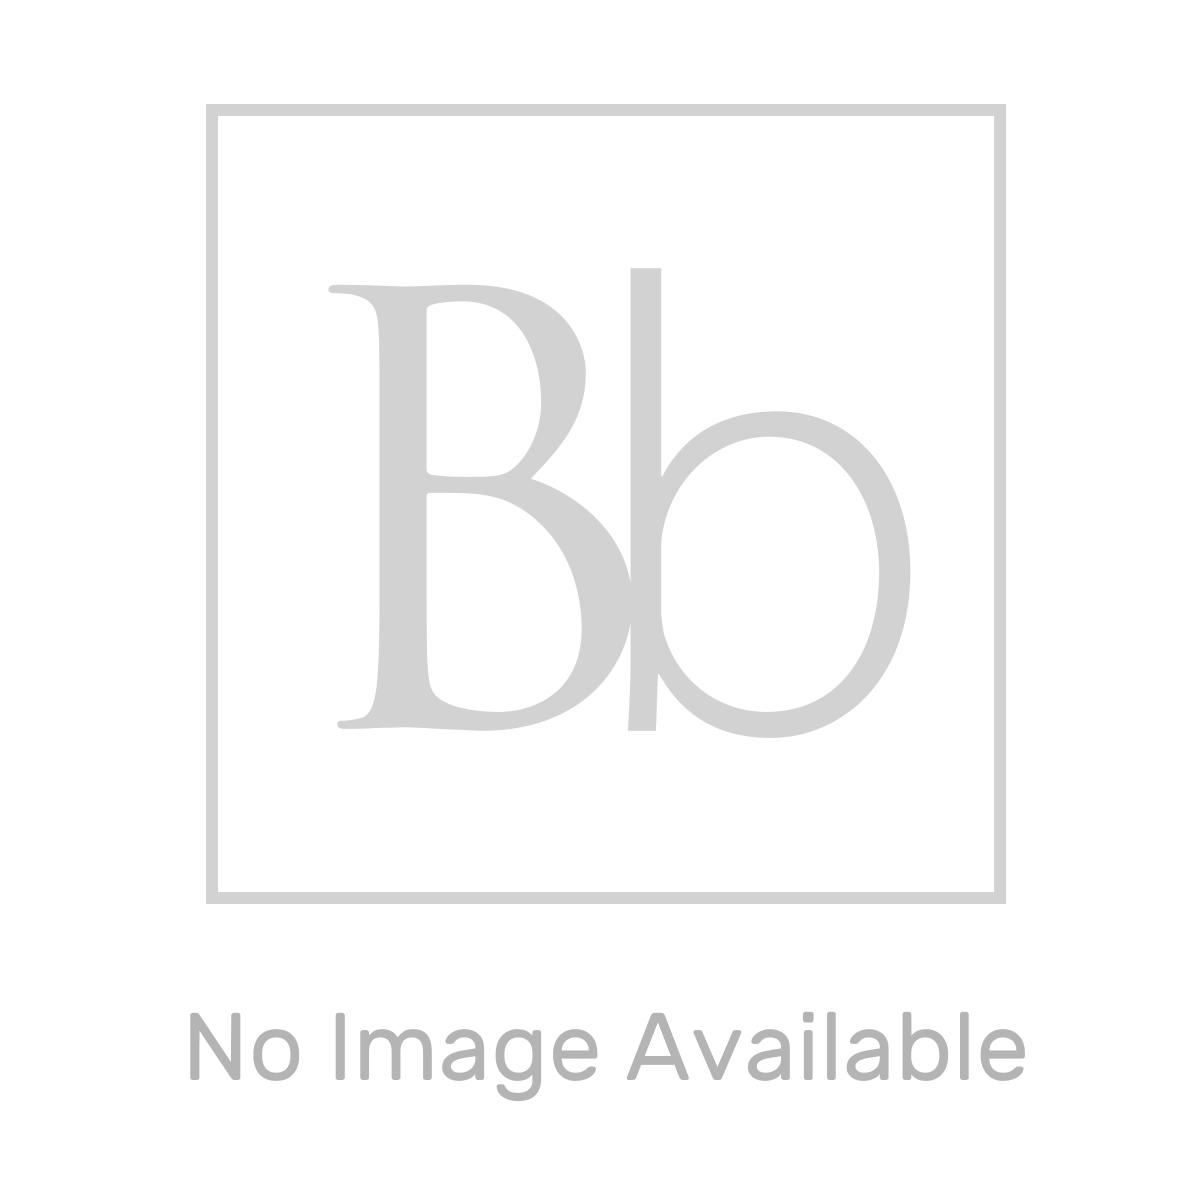 Aquadart White Slate Shower Tray 1000 x 900mm Overhead